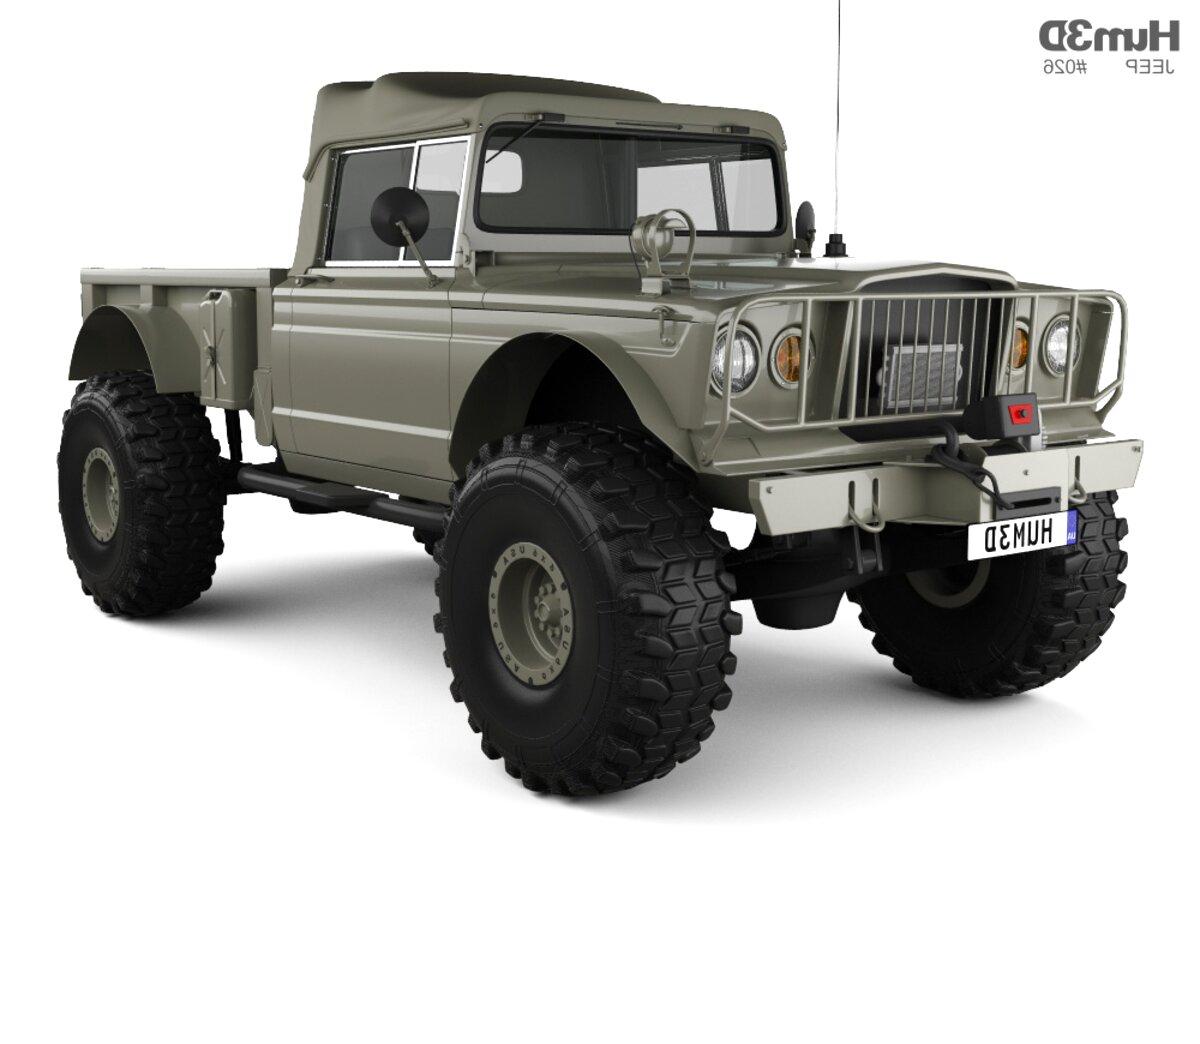 kaiser jeep for sale